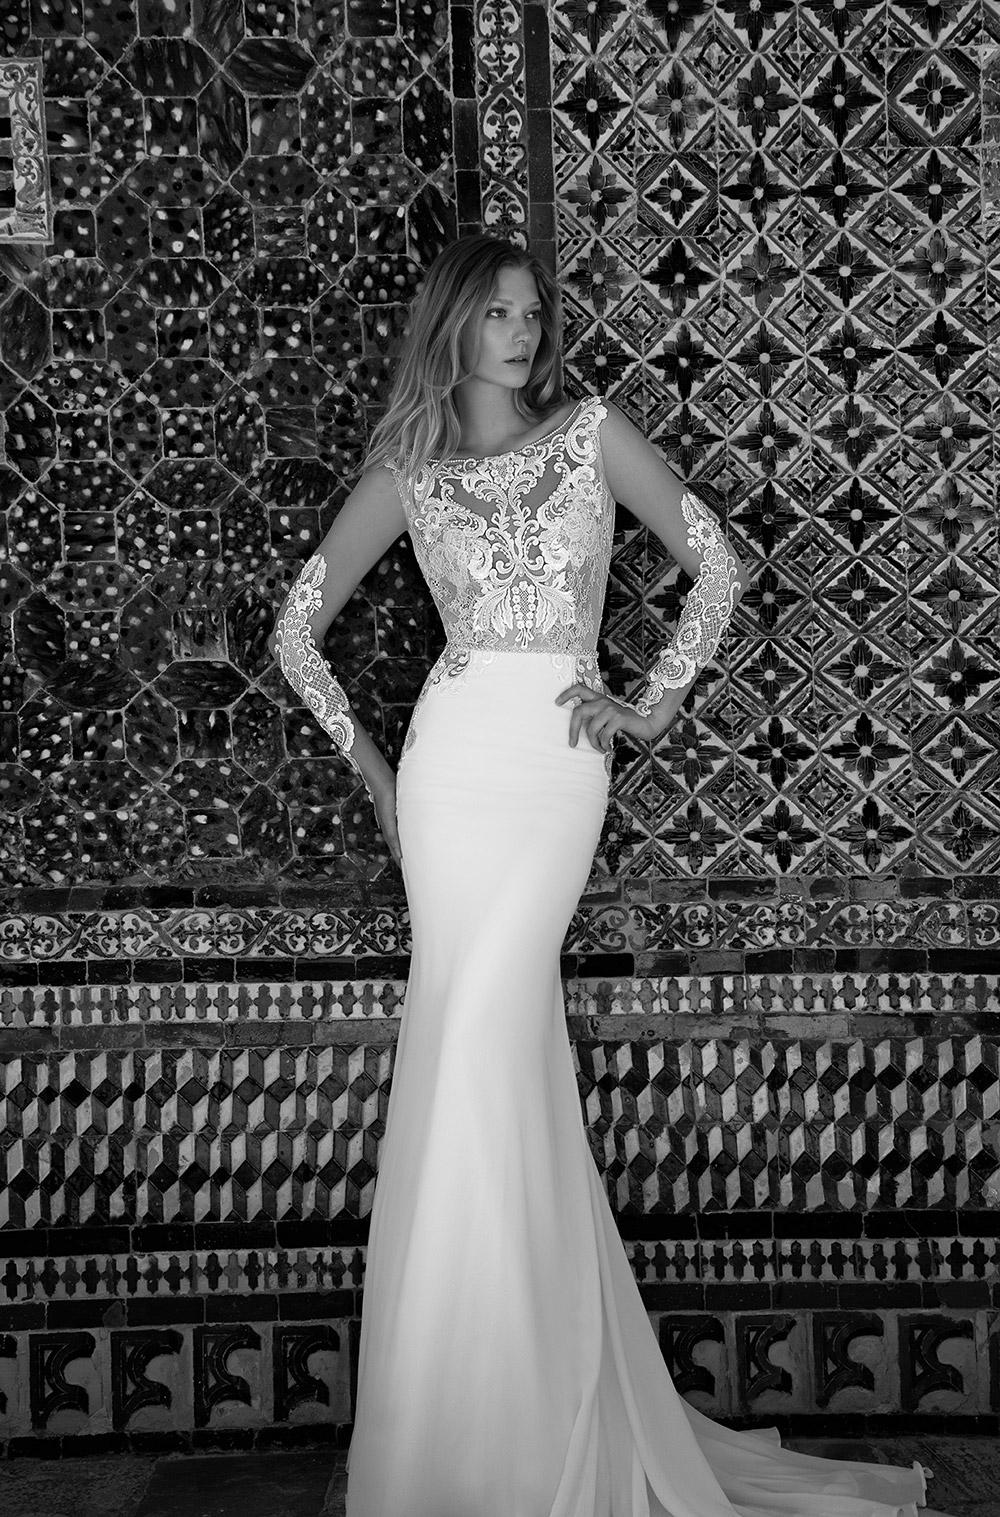 BLAIR - Alon Livne 2017 Bridal Collection. www.theweddingnotebook.com